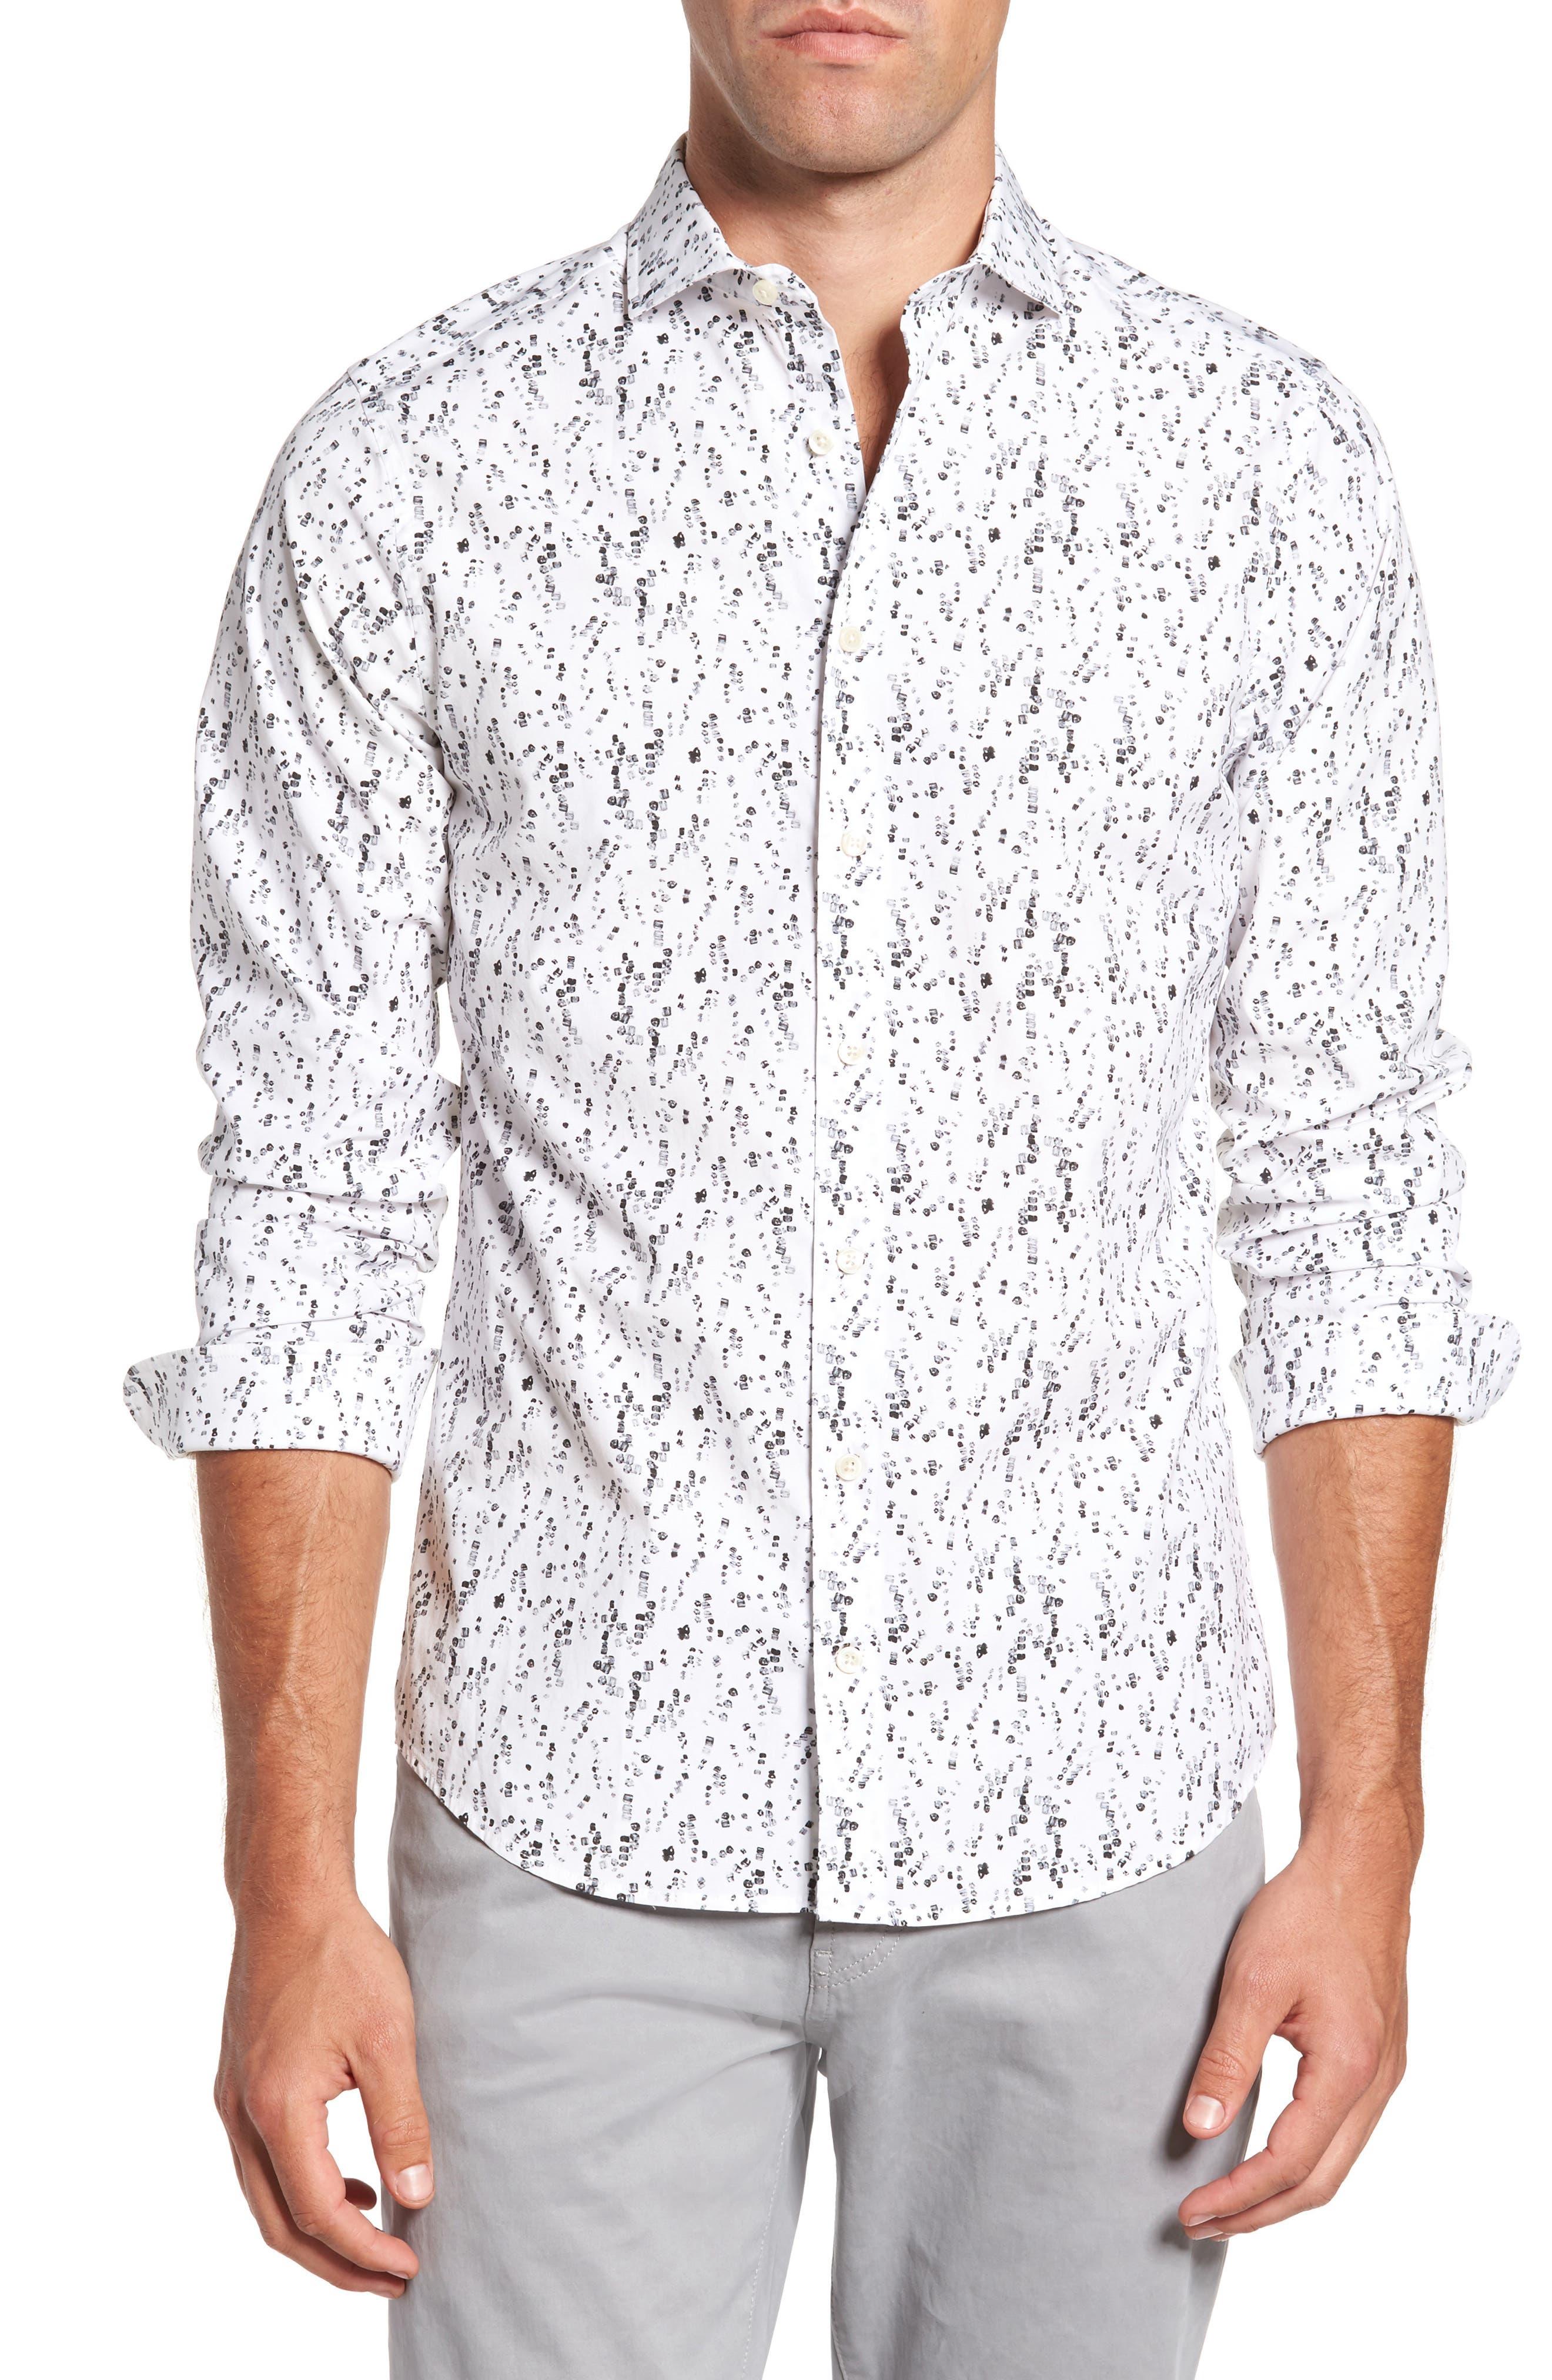 Main Image - Gant Slim Fit Crushed Ice Print Sport Shirt